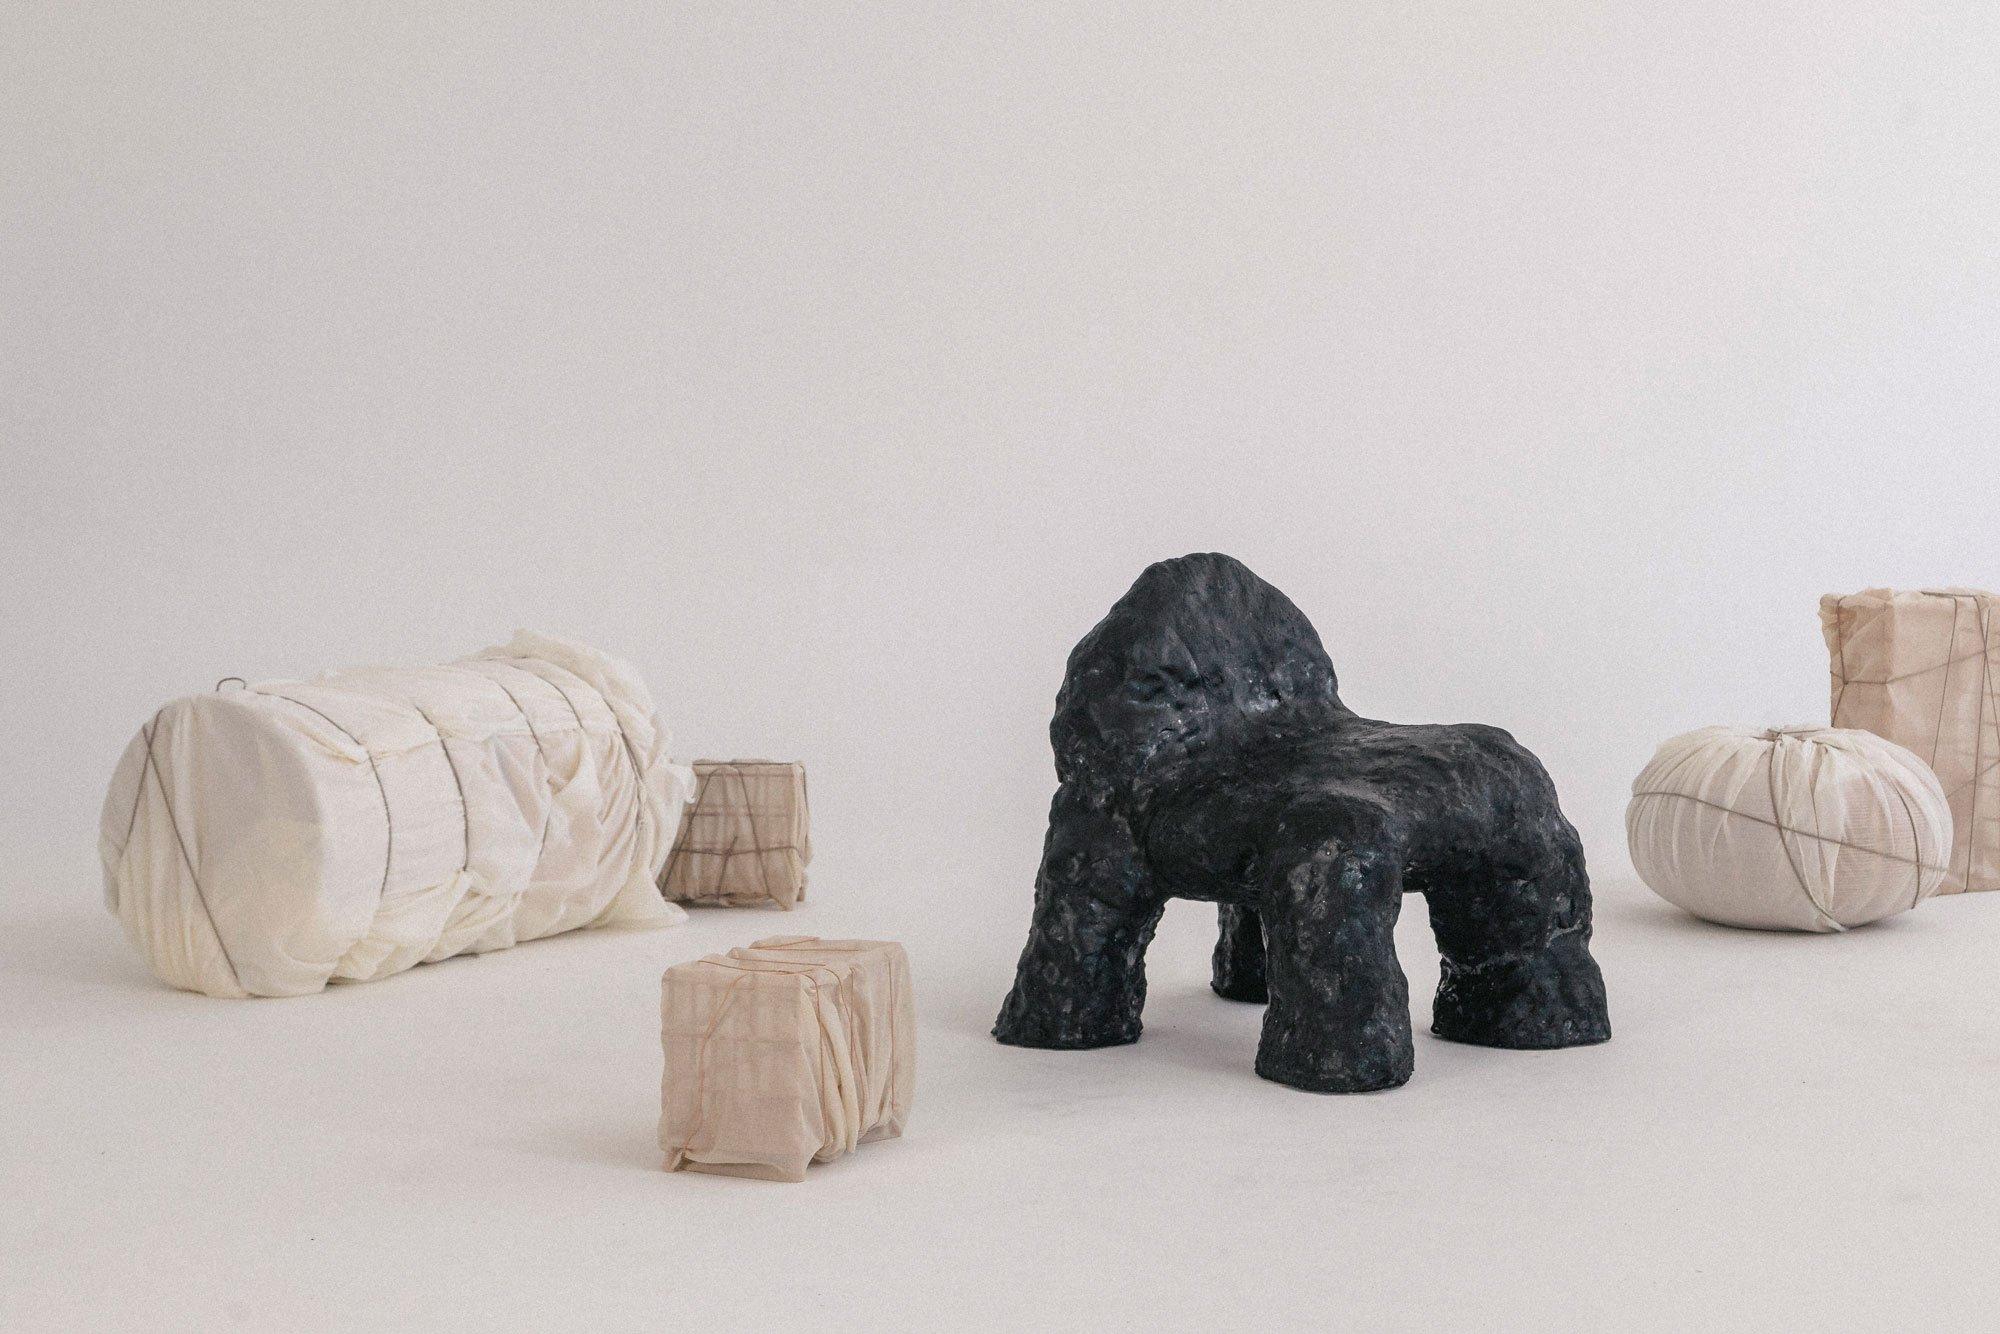 Ukurant Objects, 3daysofdesign 2020, jeunes designers, Bonnie Hvillum